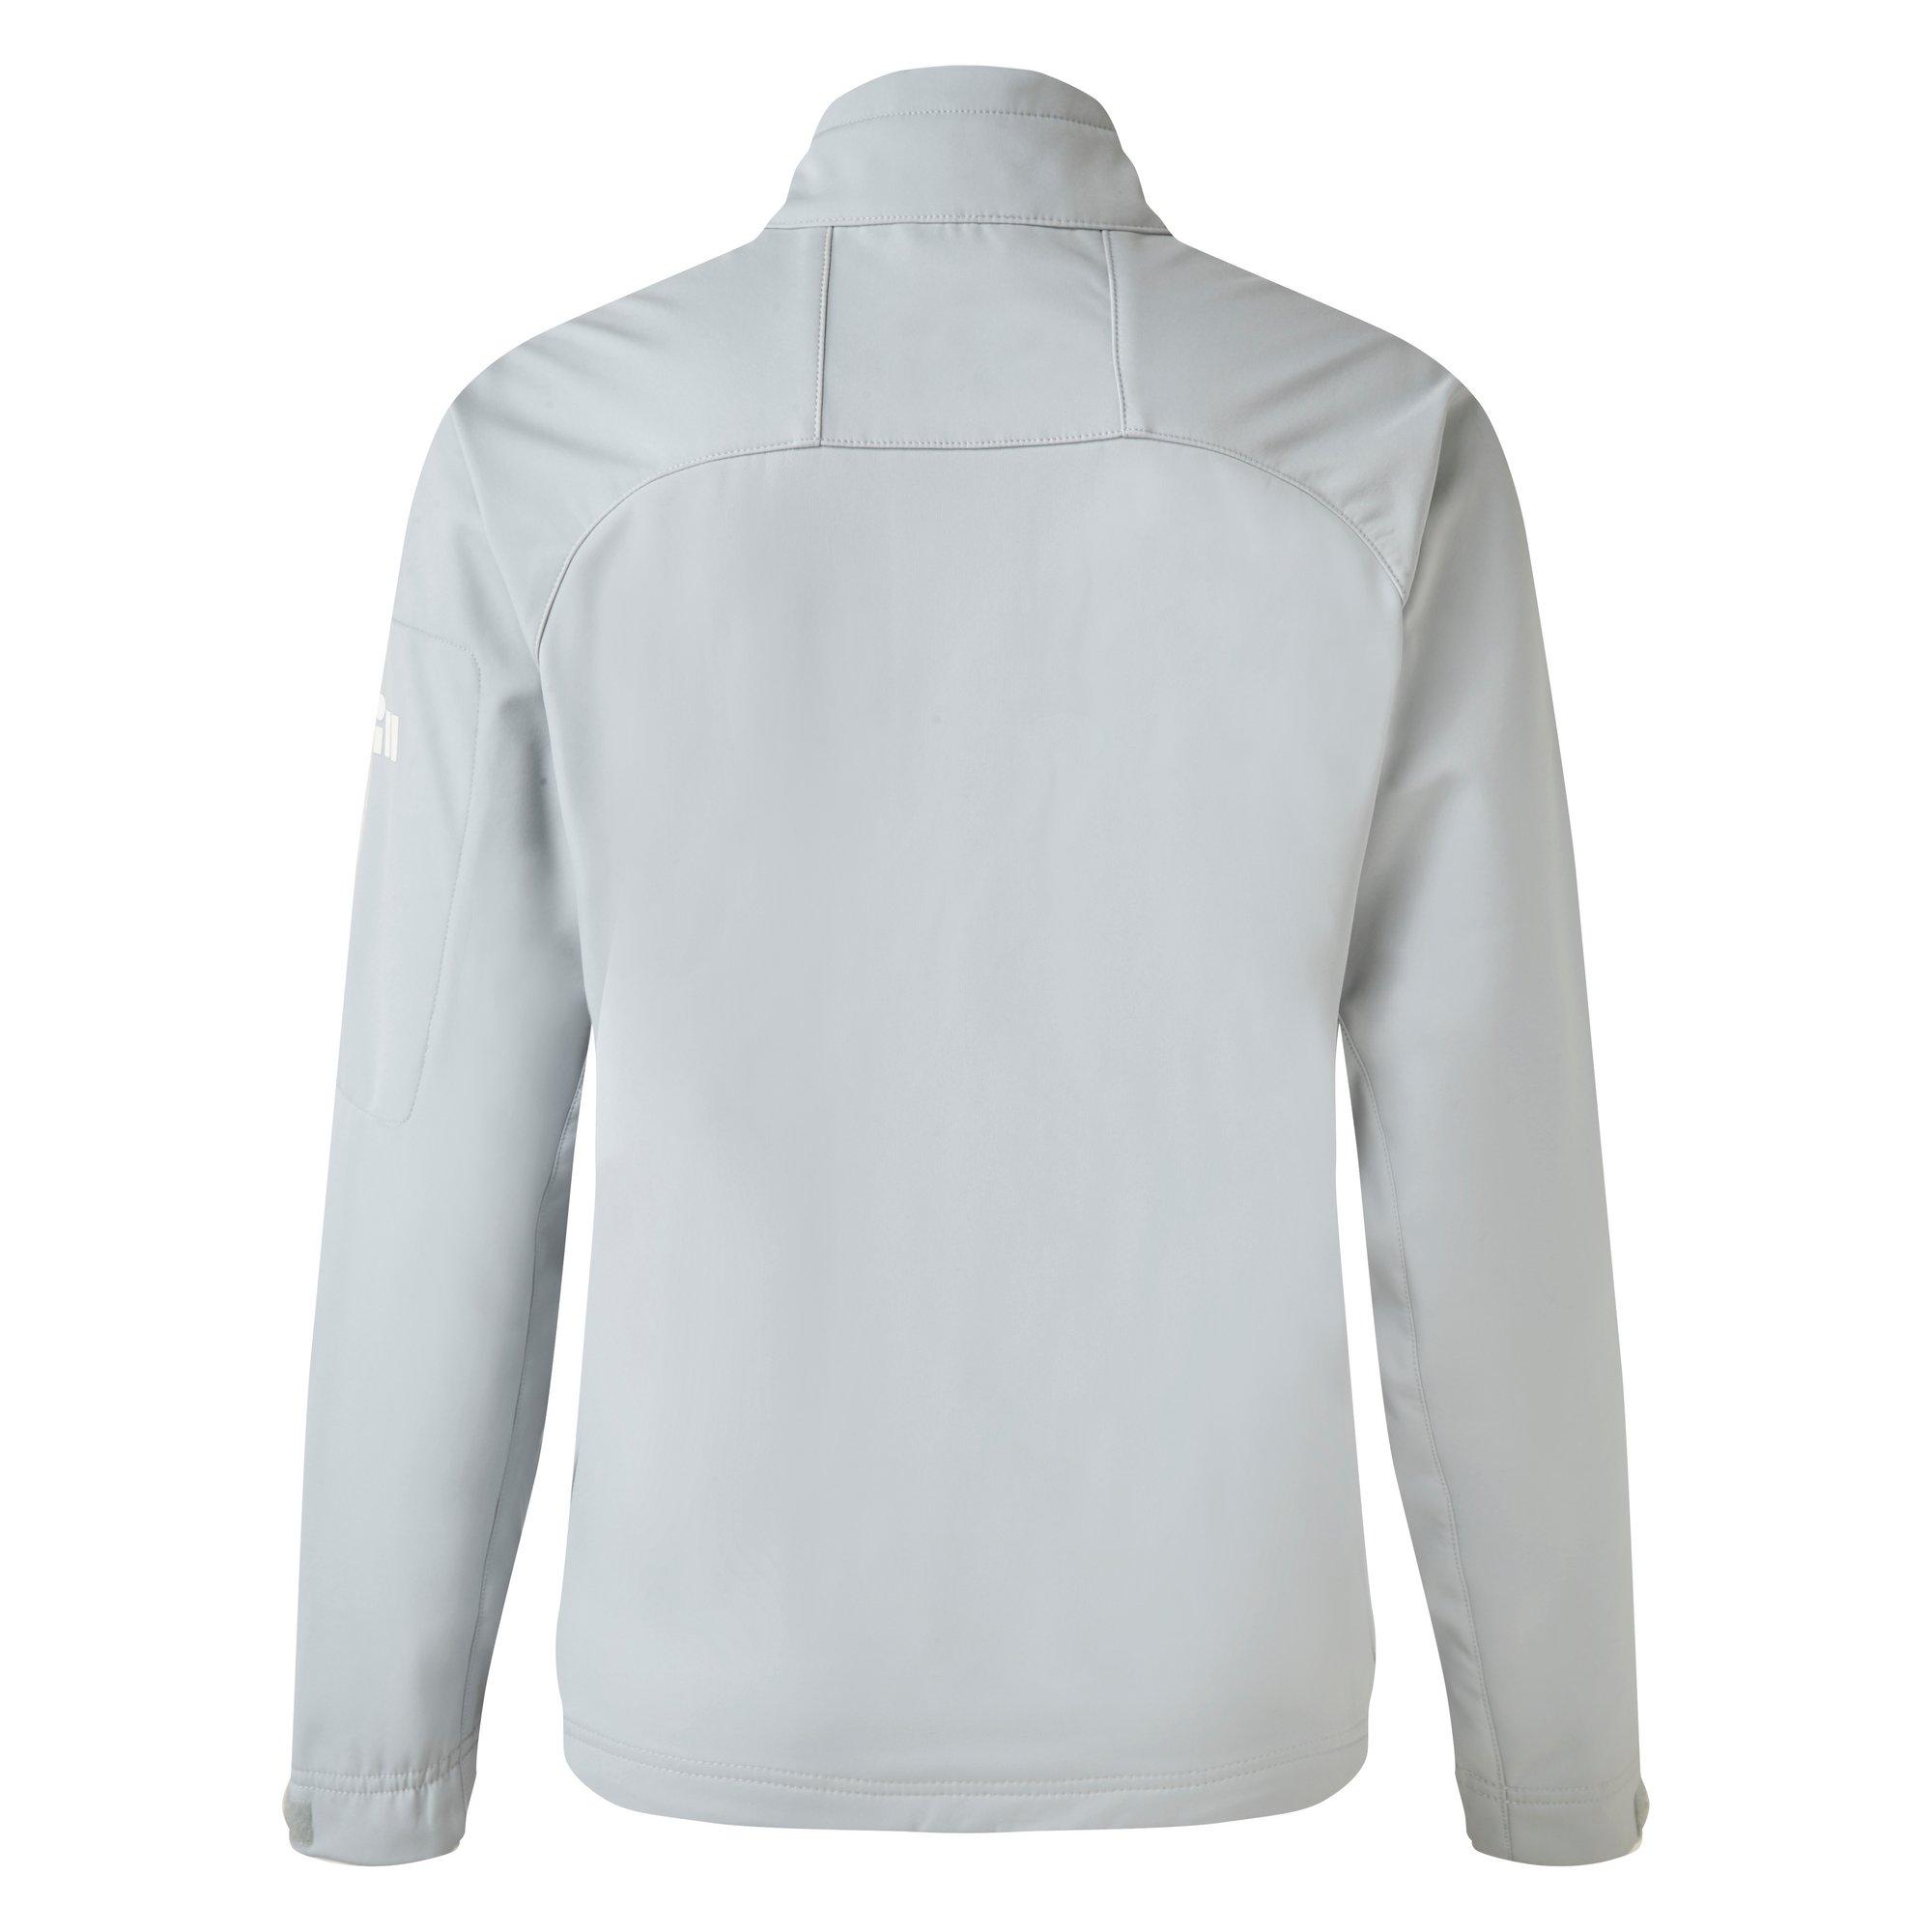 Women's Team Softshell Jacket - 1614W-GRE14-2.jpg